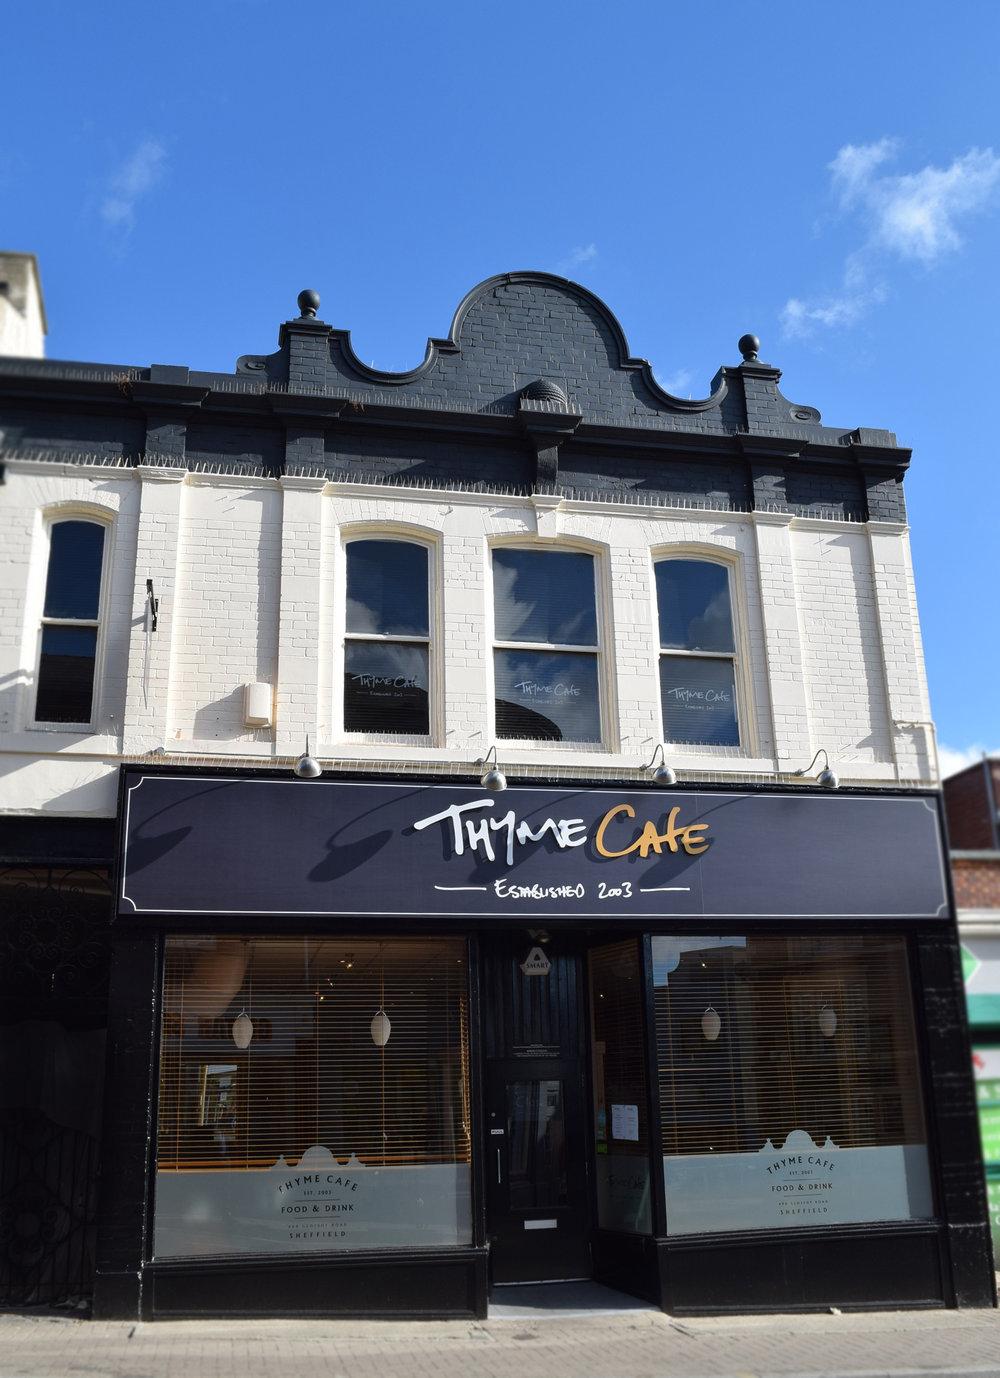 Thyme Cafe Branding, Signage & Website  www.thymecafe.co.uk